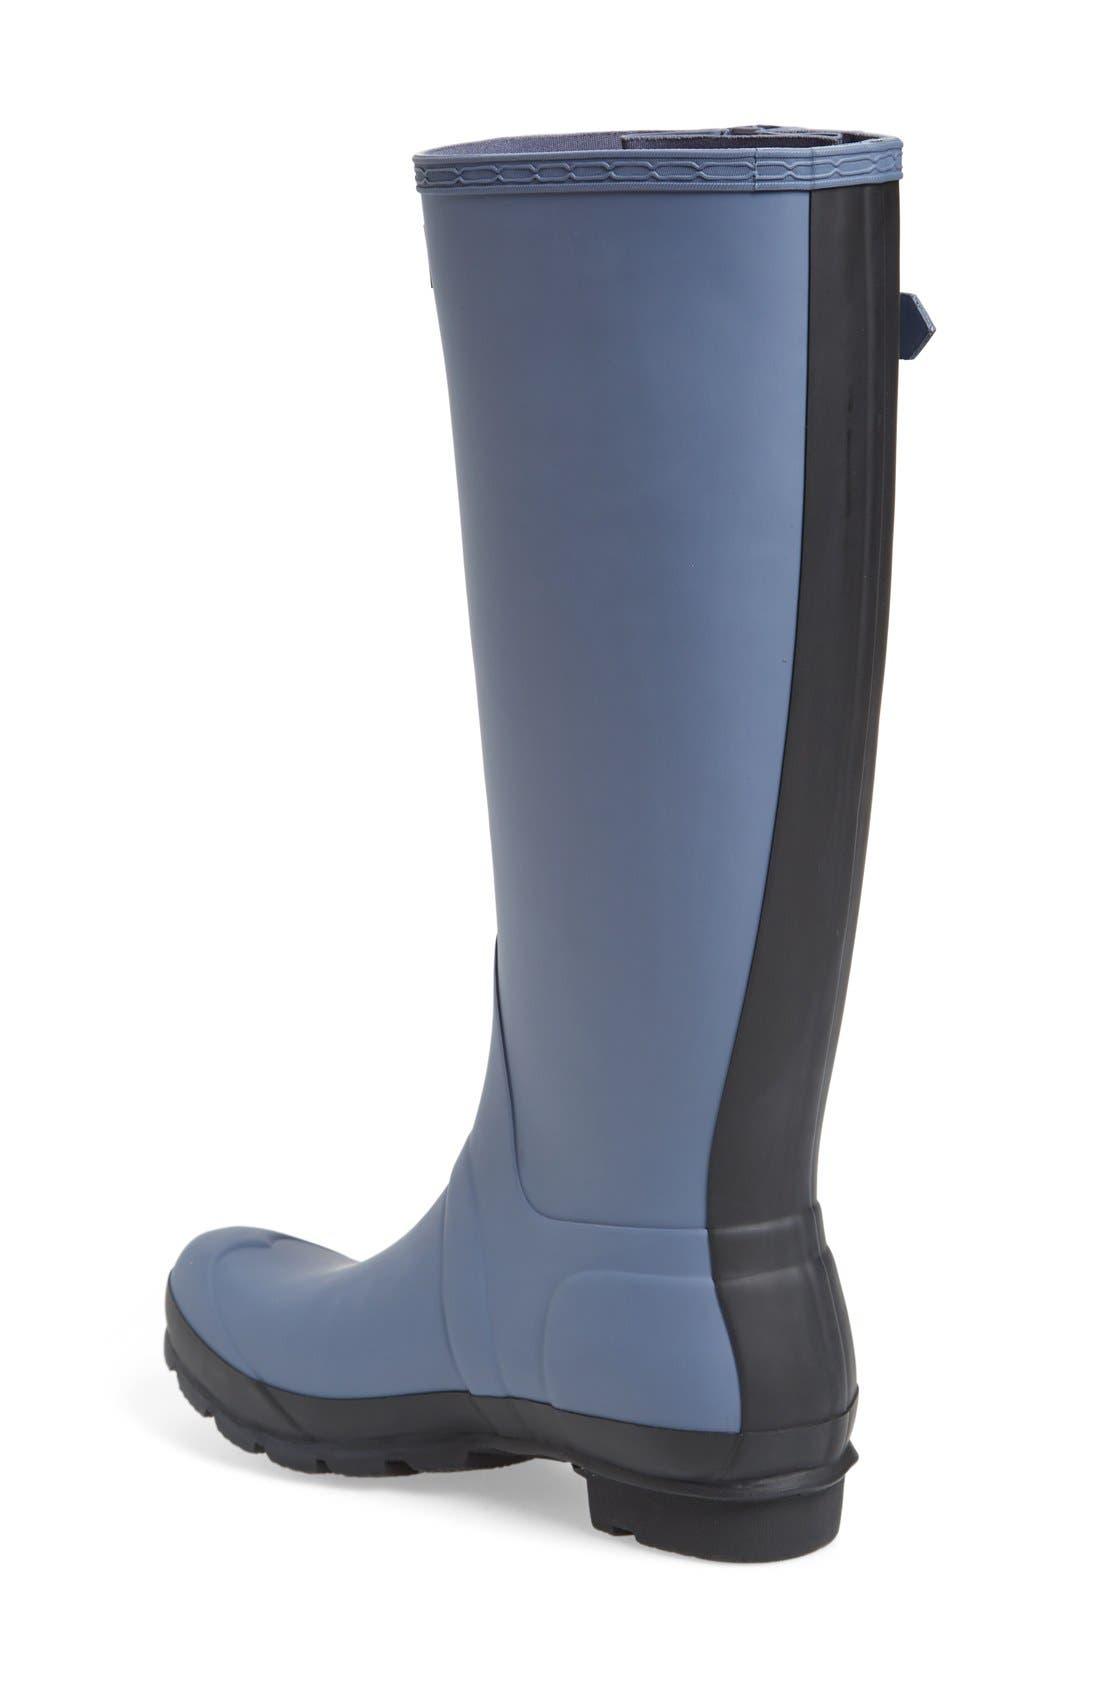 Alternate Image 2  - Hunter 'Original Slim' Two-Tone Rubber Rain Boot (Women)